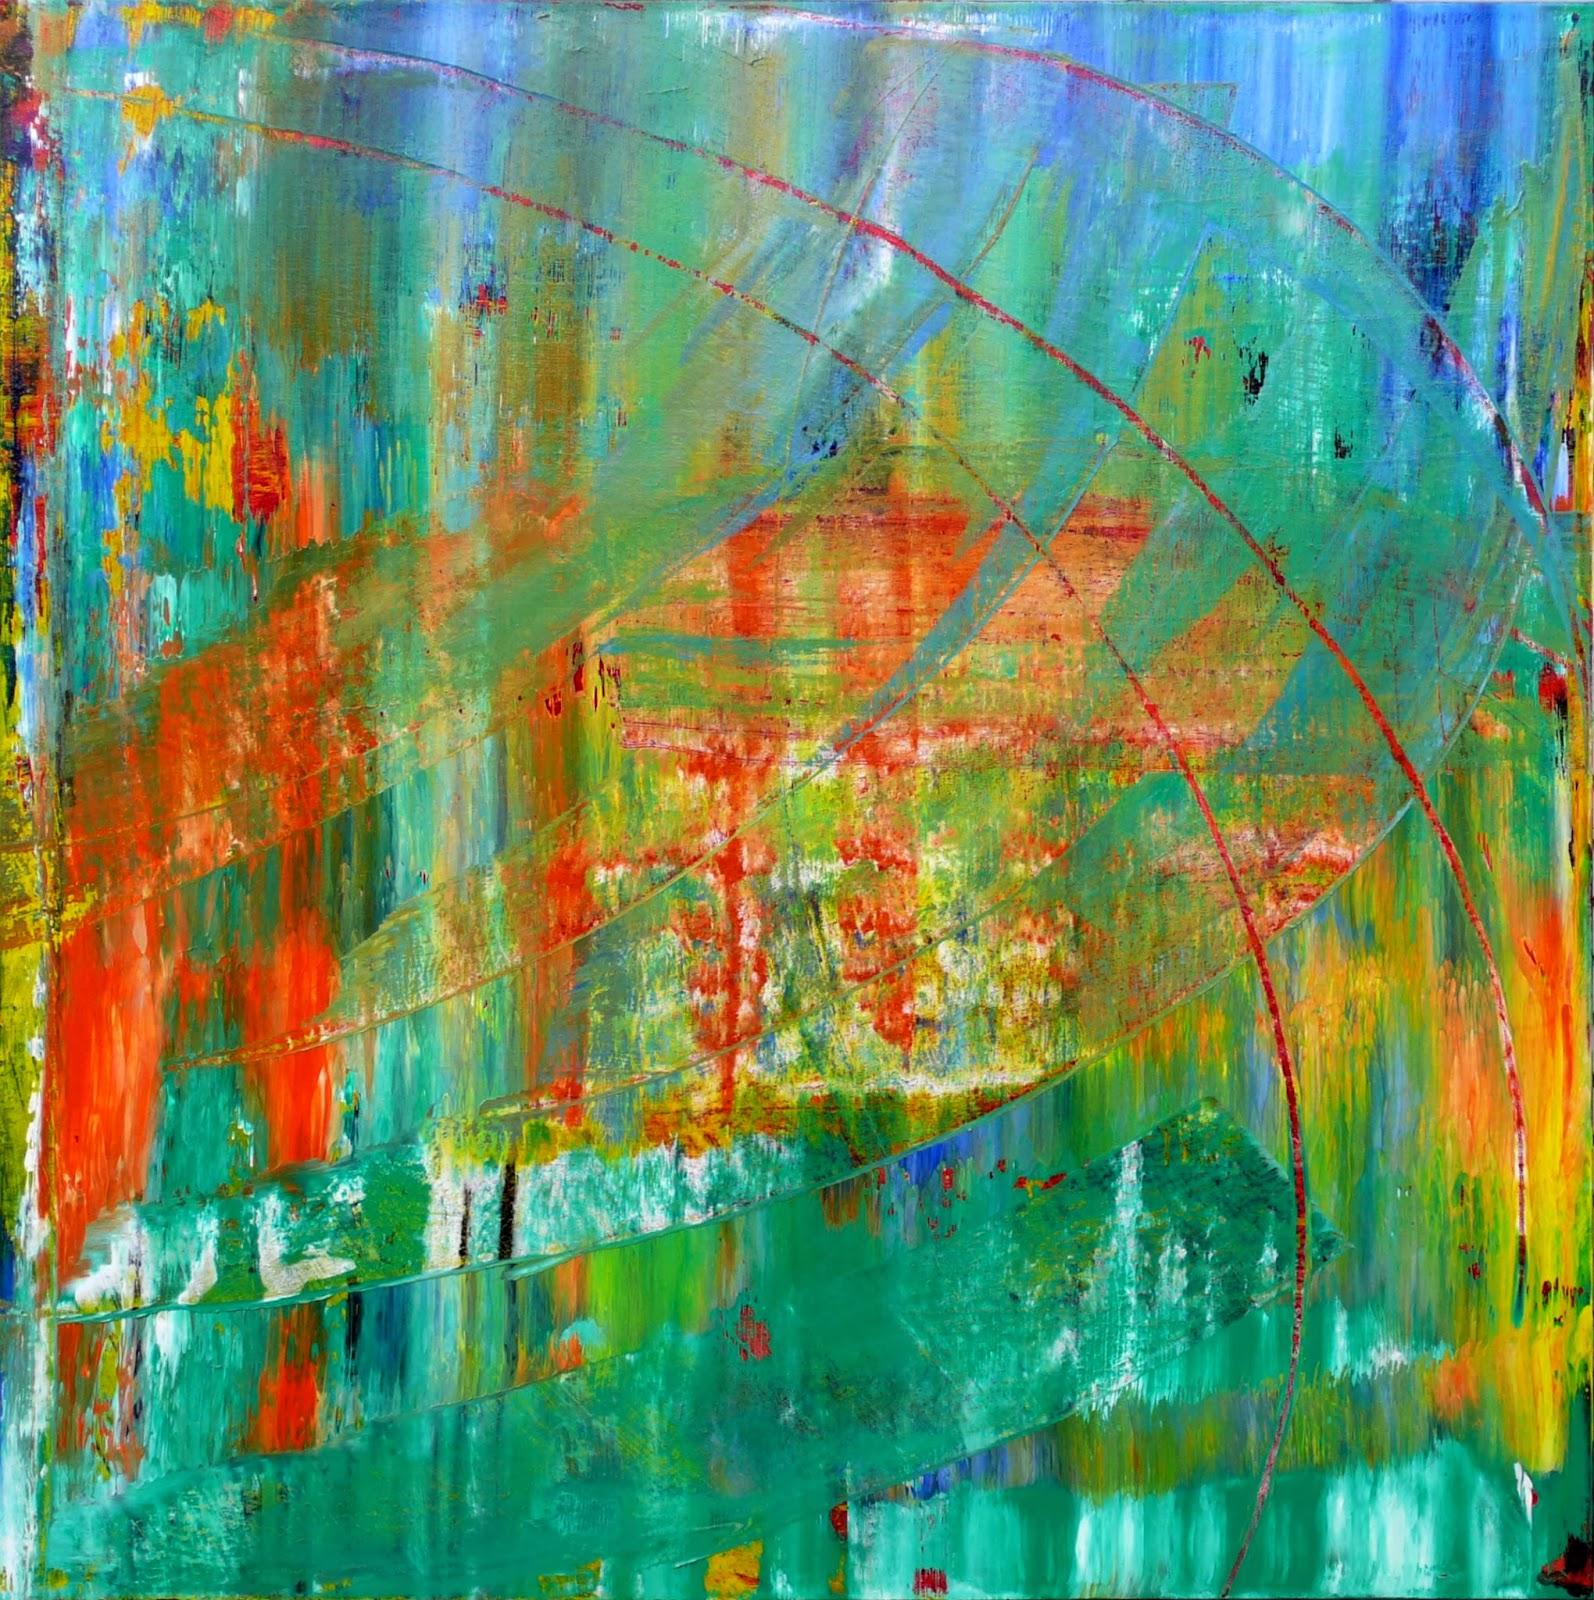 Modernes Design Malerei : Painting malerei moderne kunst art holm piesker